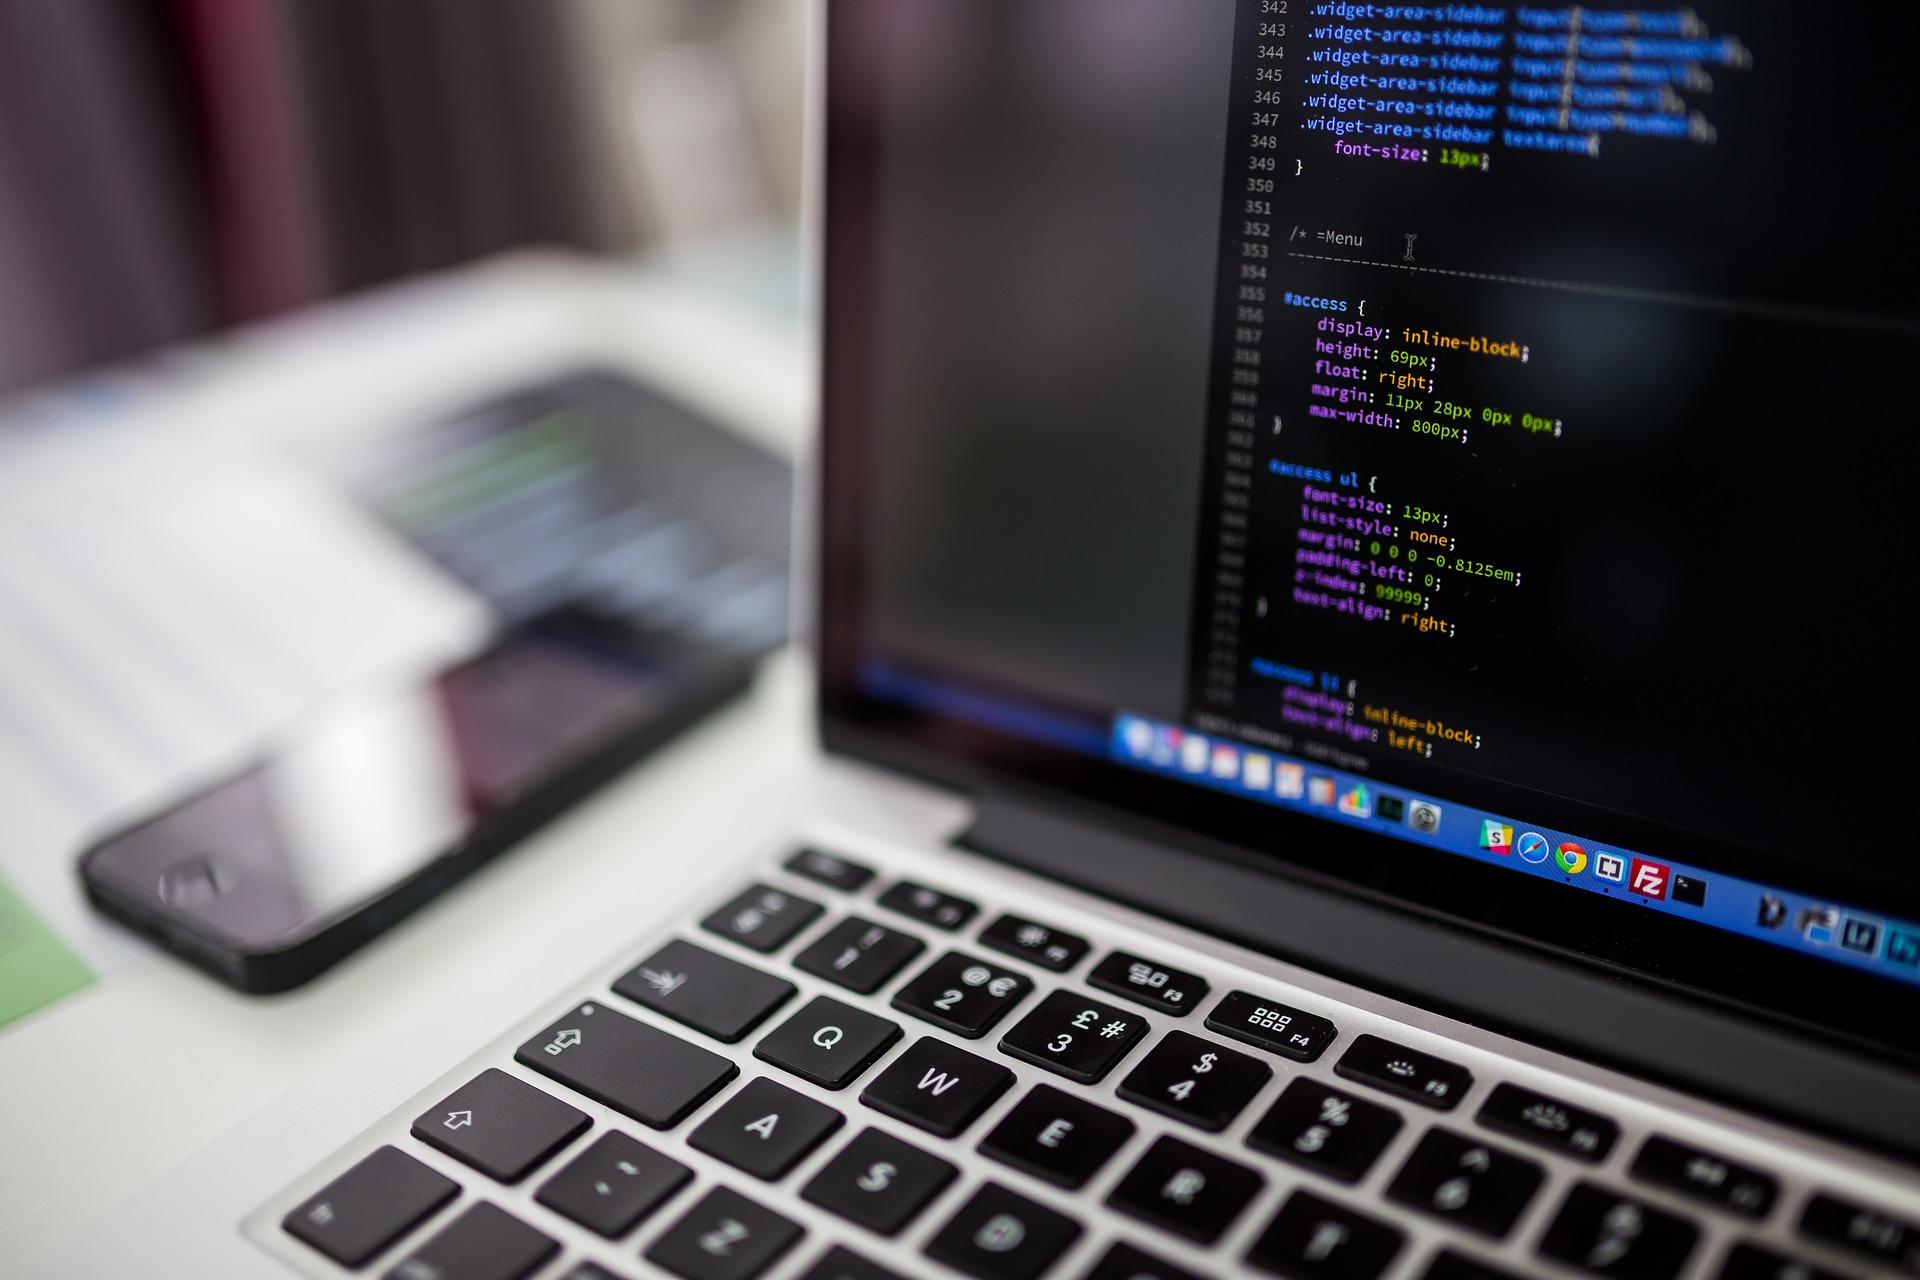 developpement-services-web-mobile-maintenance-support